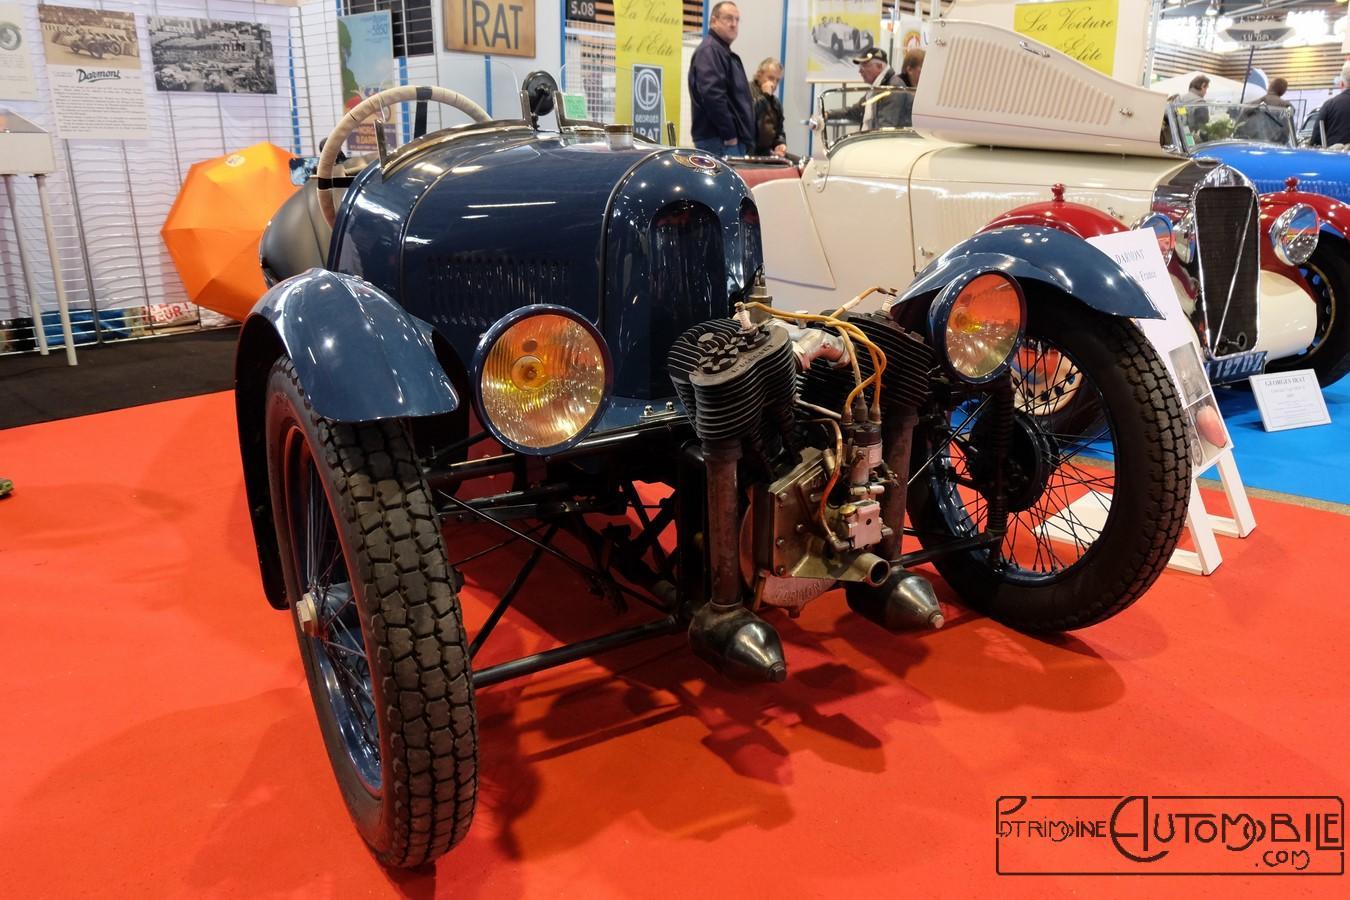 tricyclecar darmont patrimoine automobile com. Black Bedroom Furniture Sets. Home Design Ideas